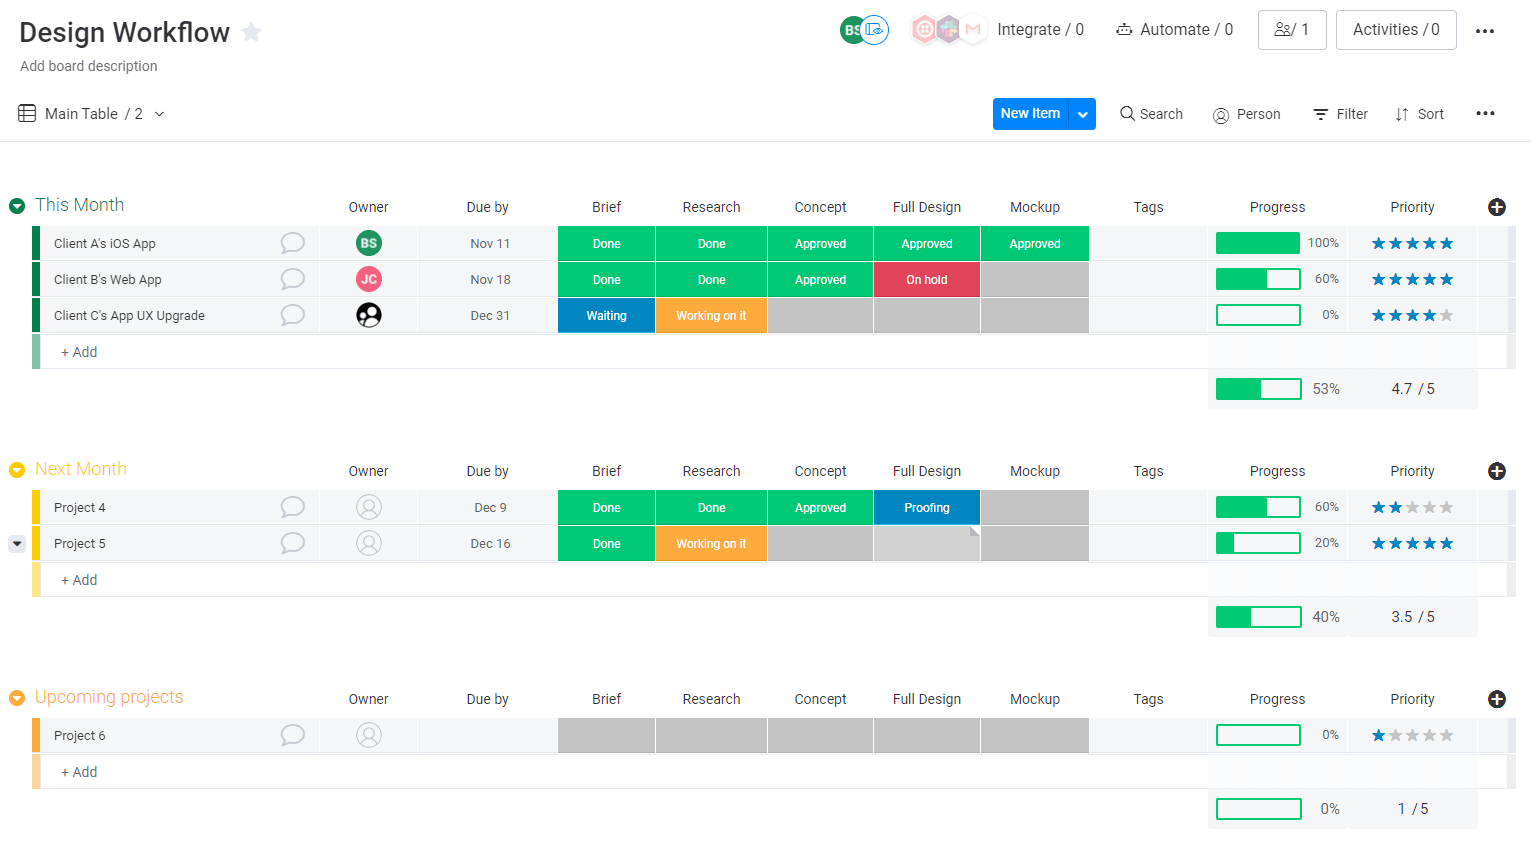 Design workflow board in monday.com UI